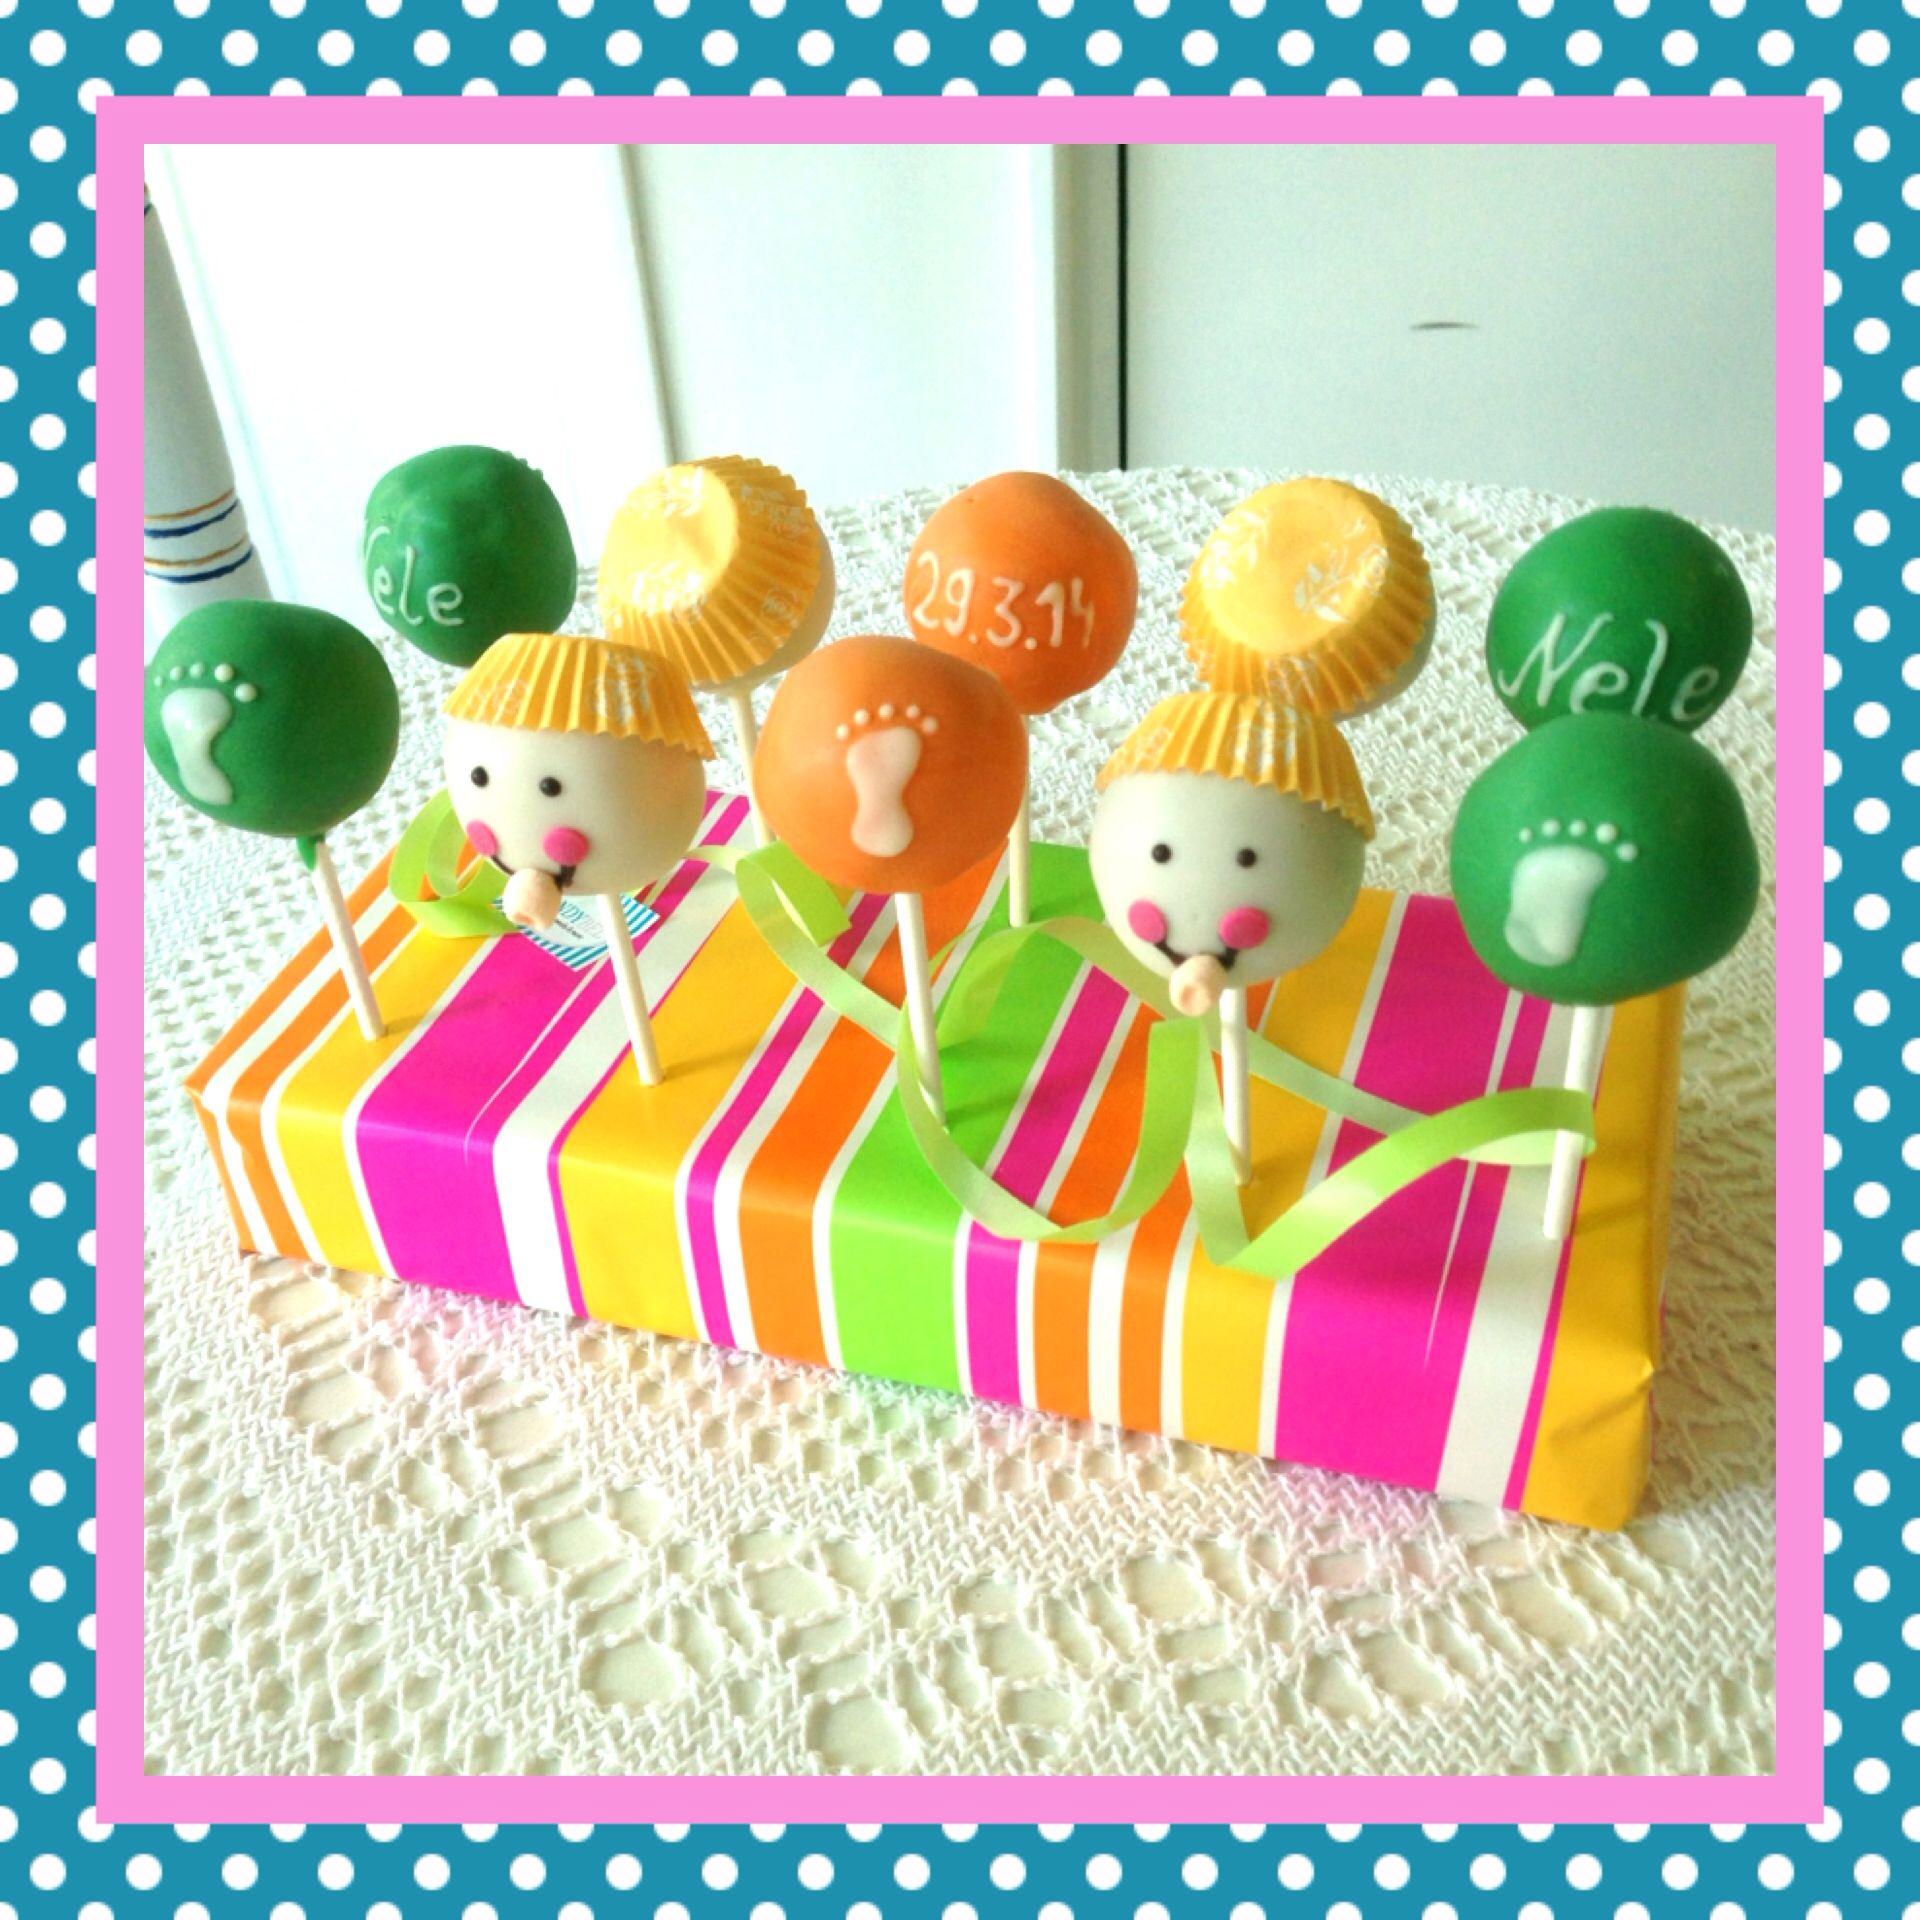 Bunter Baby Cake Pops Mix  #sandybel #cakepops #baby